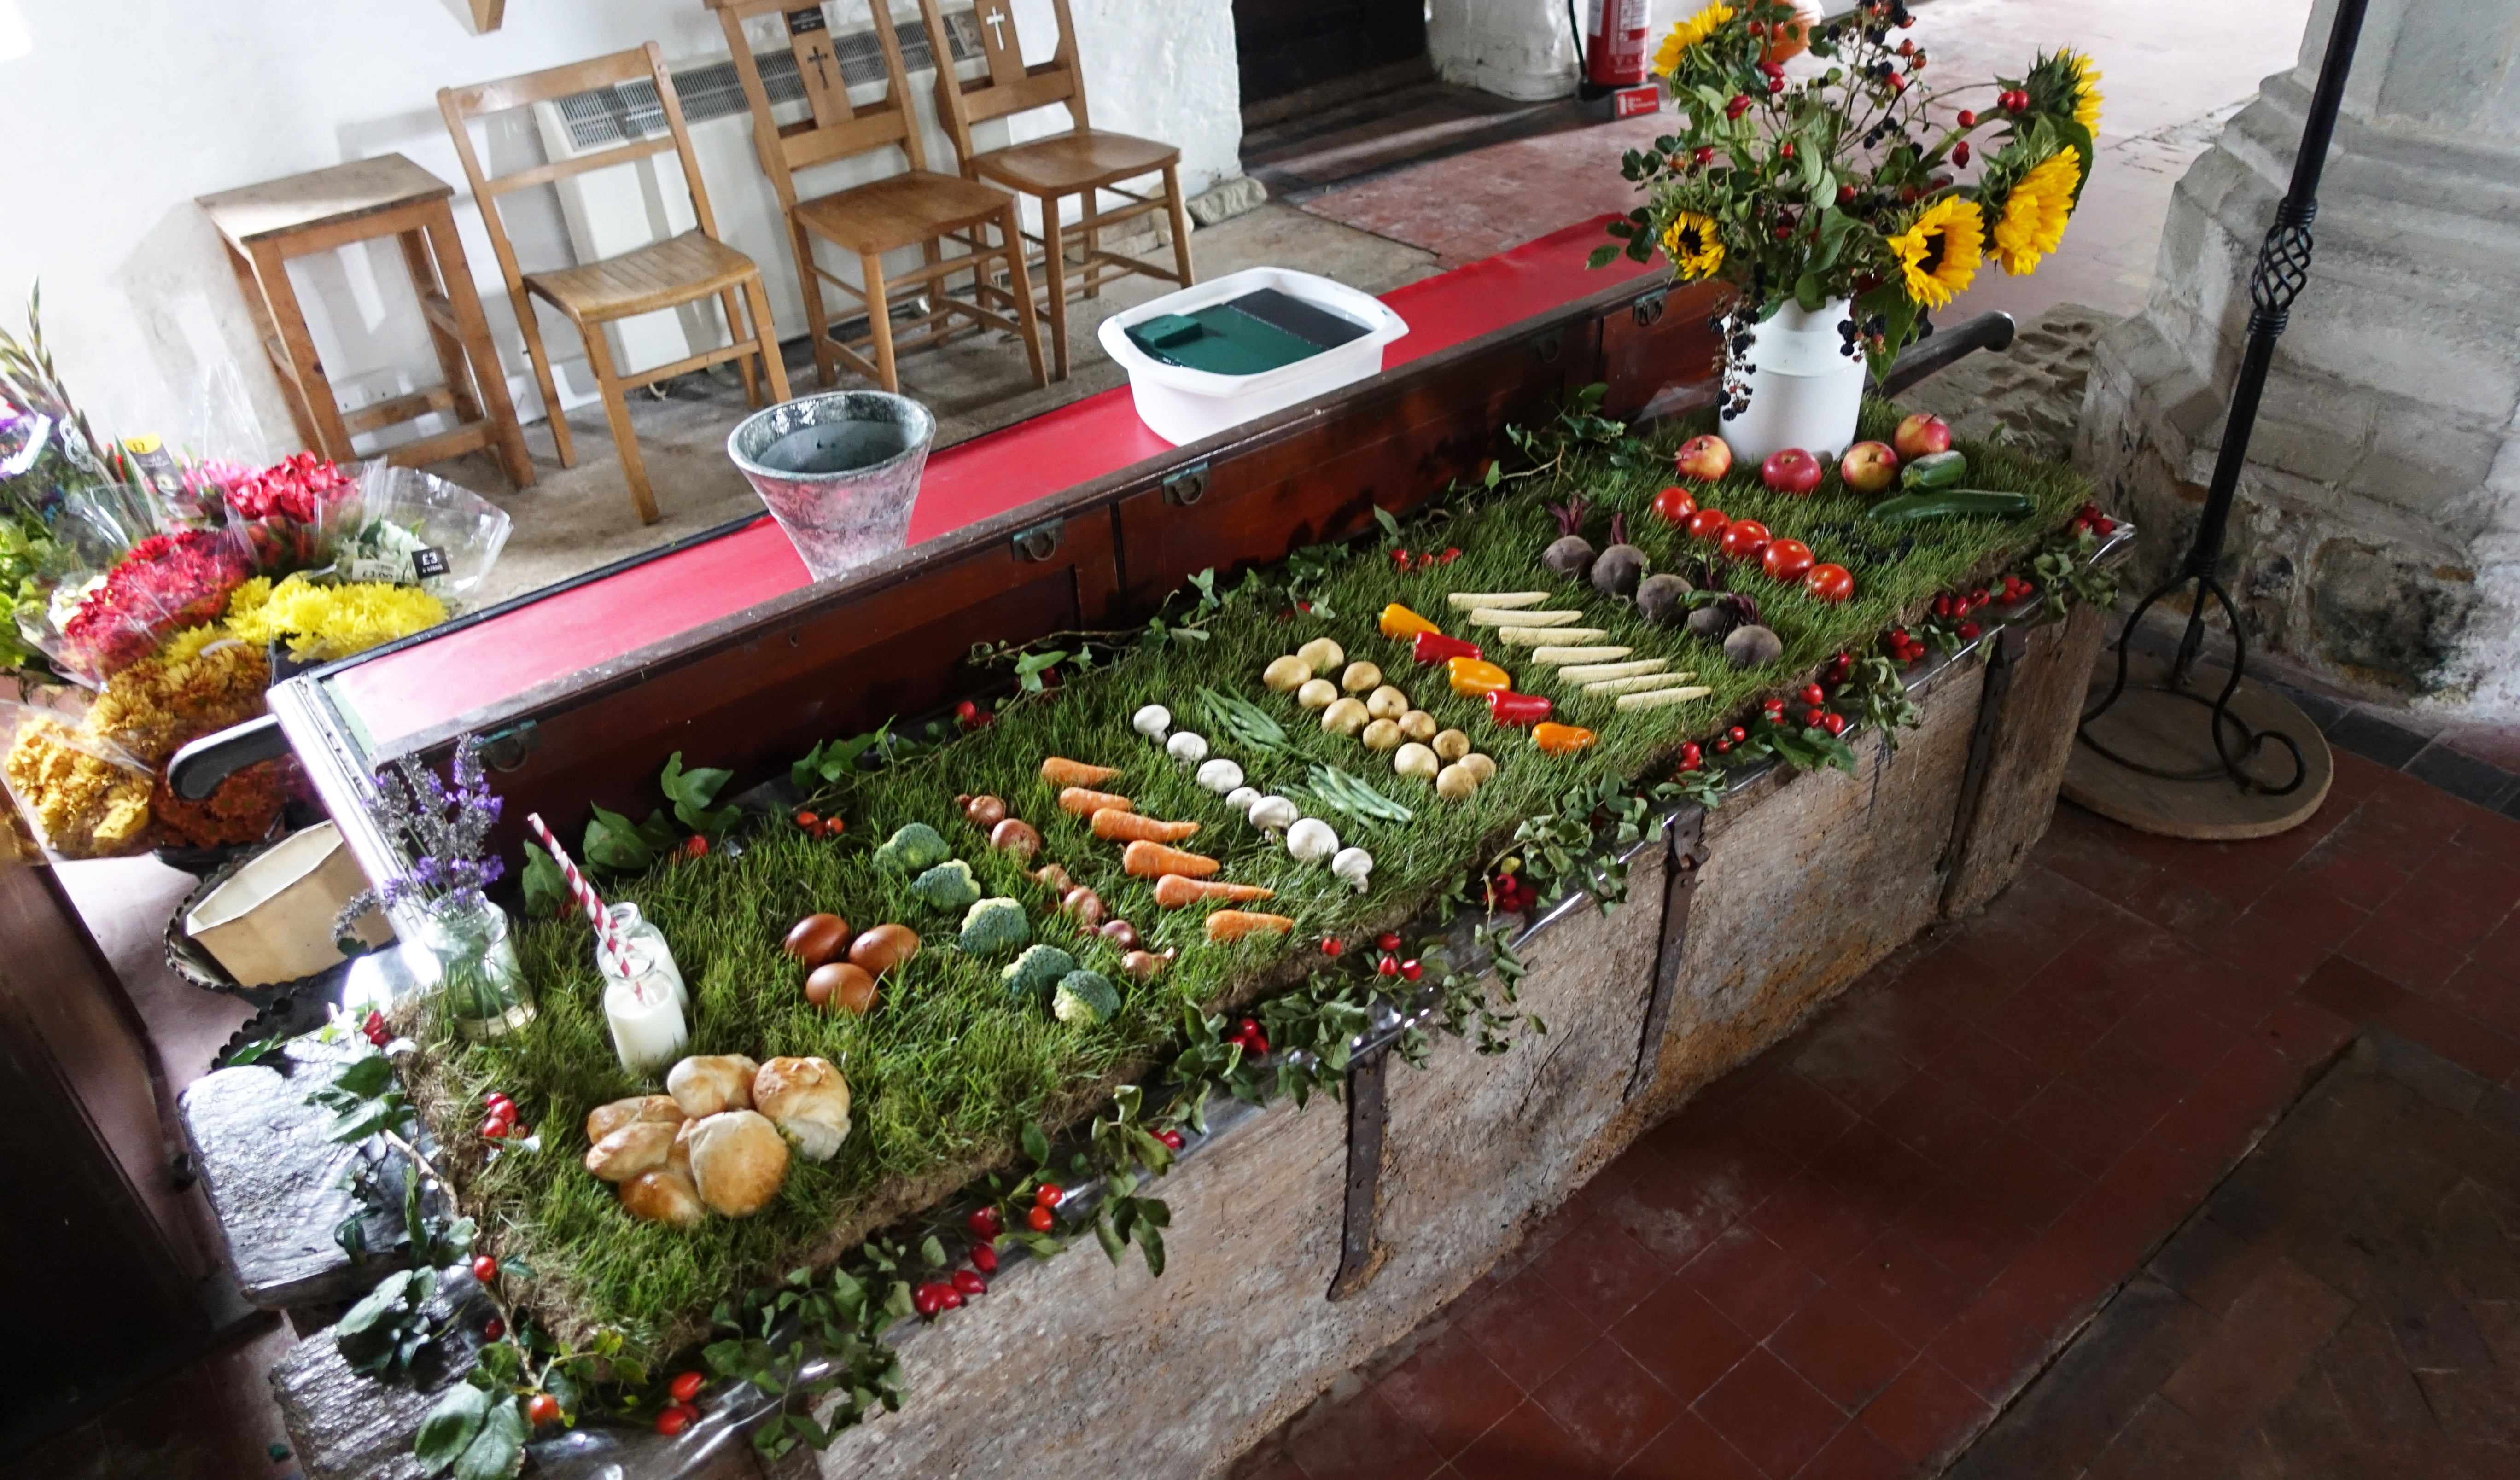 Part of the harvest festival display at St. Pancras Church, Arlington